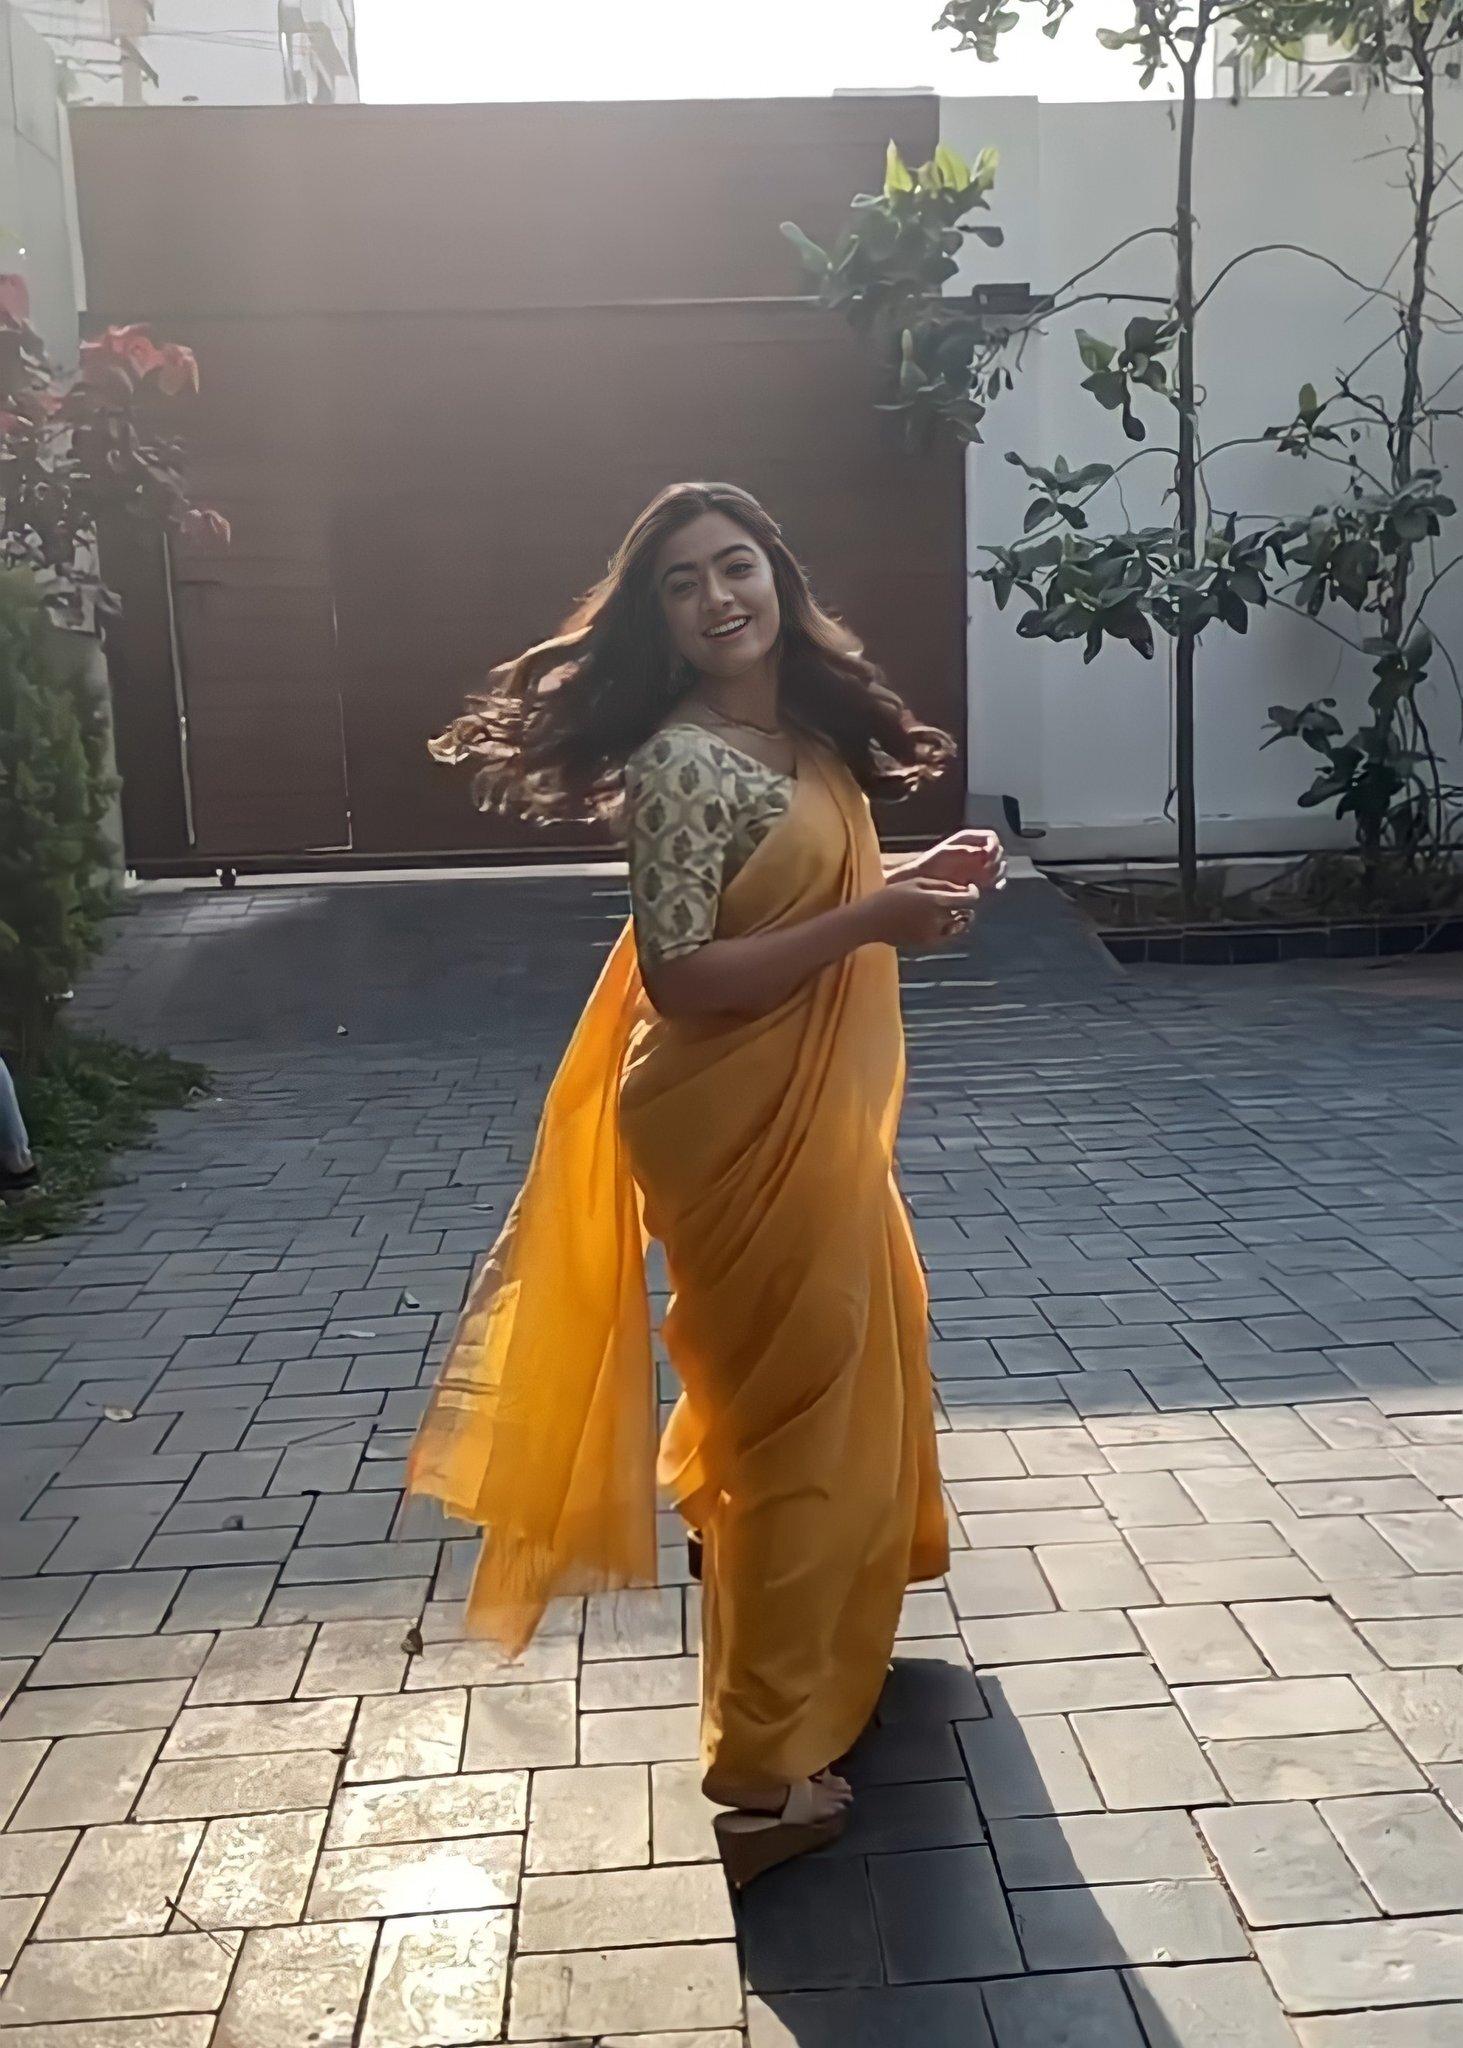 Rashmika Mandanna:హాట్ ఫోటోషూట్ తో రెచ్చిపోయిన రష్మిక,, ఈ అందం అదరహో (ఫొటోస్)